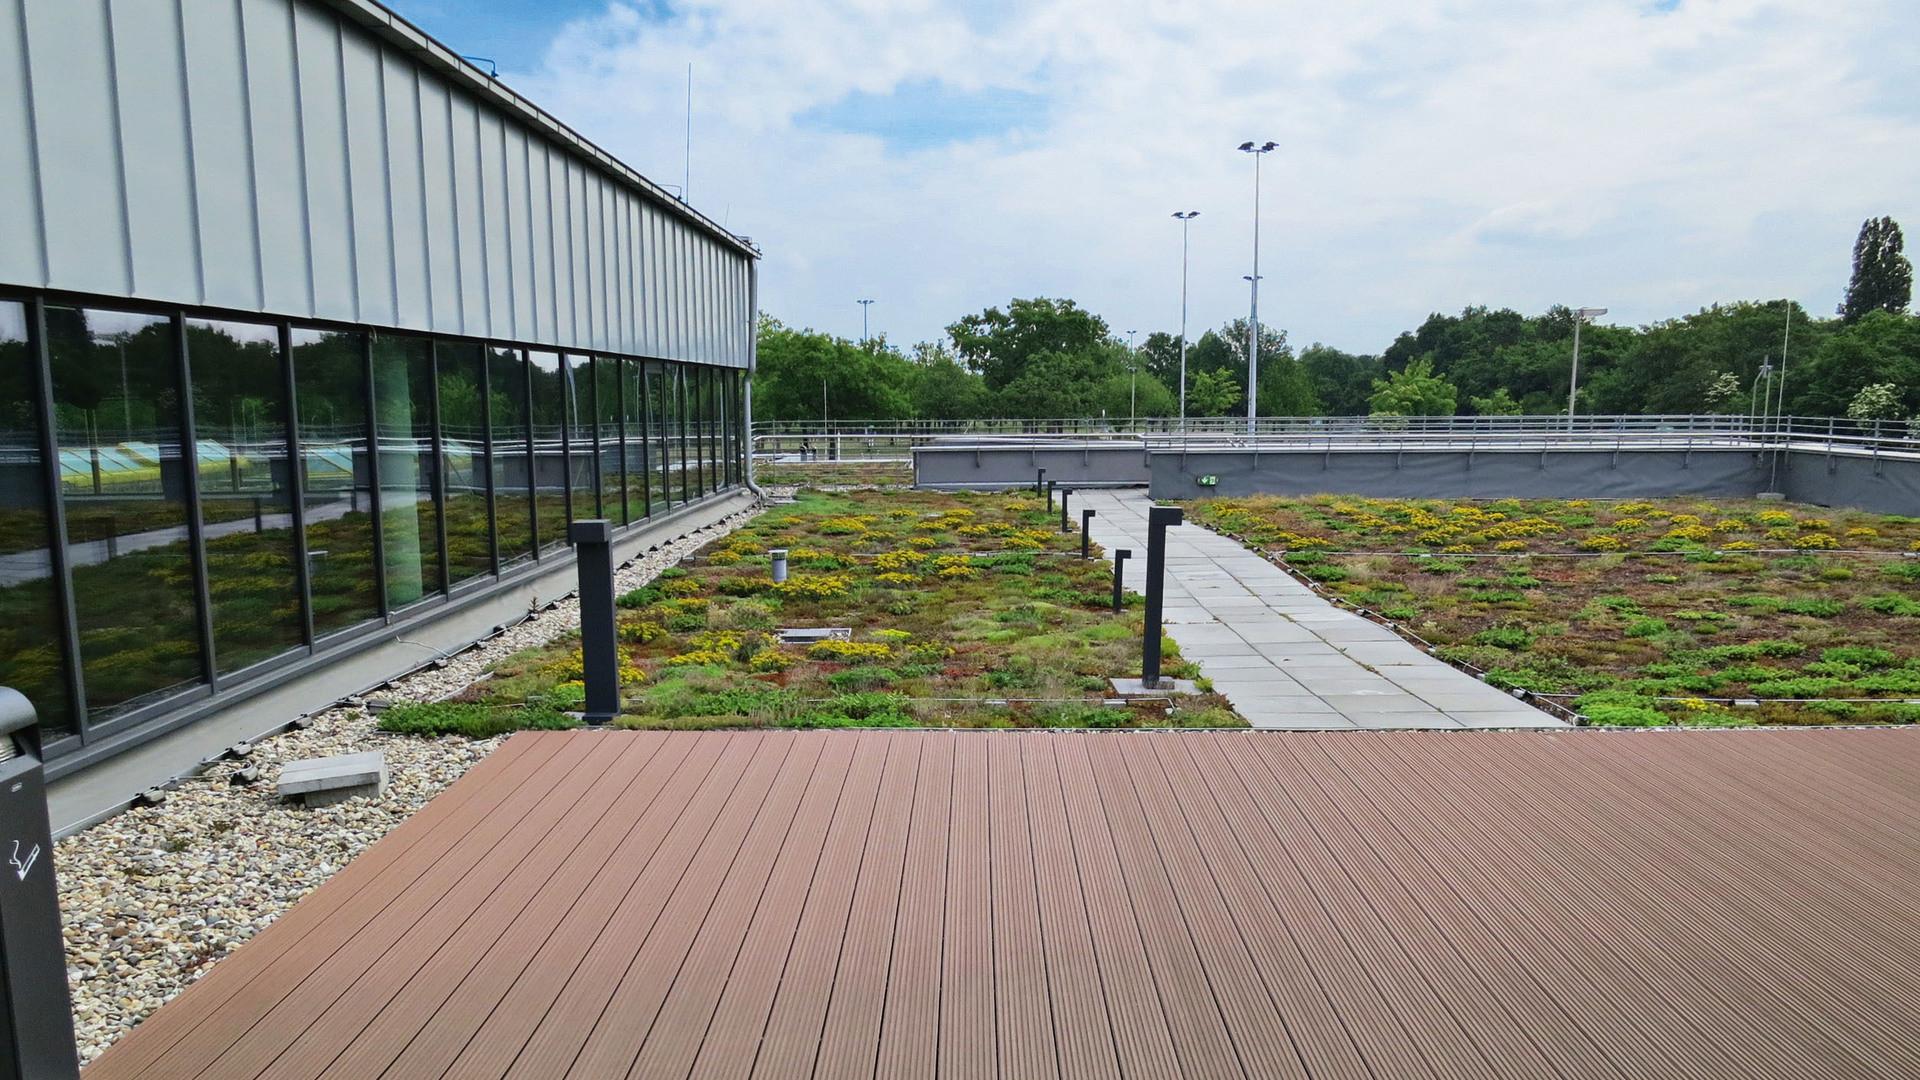 flatroof, flat roof, higher stressed flat roof, roof terrace, megarock, germany